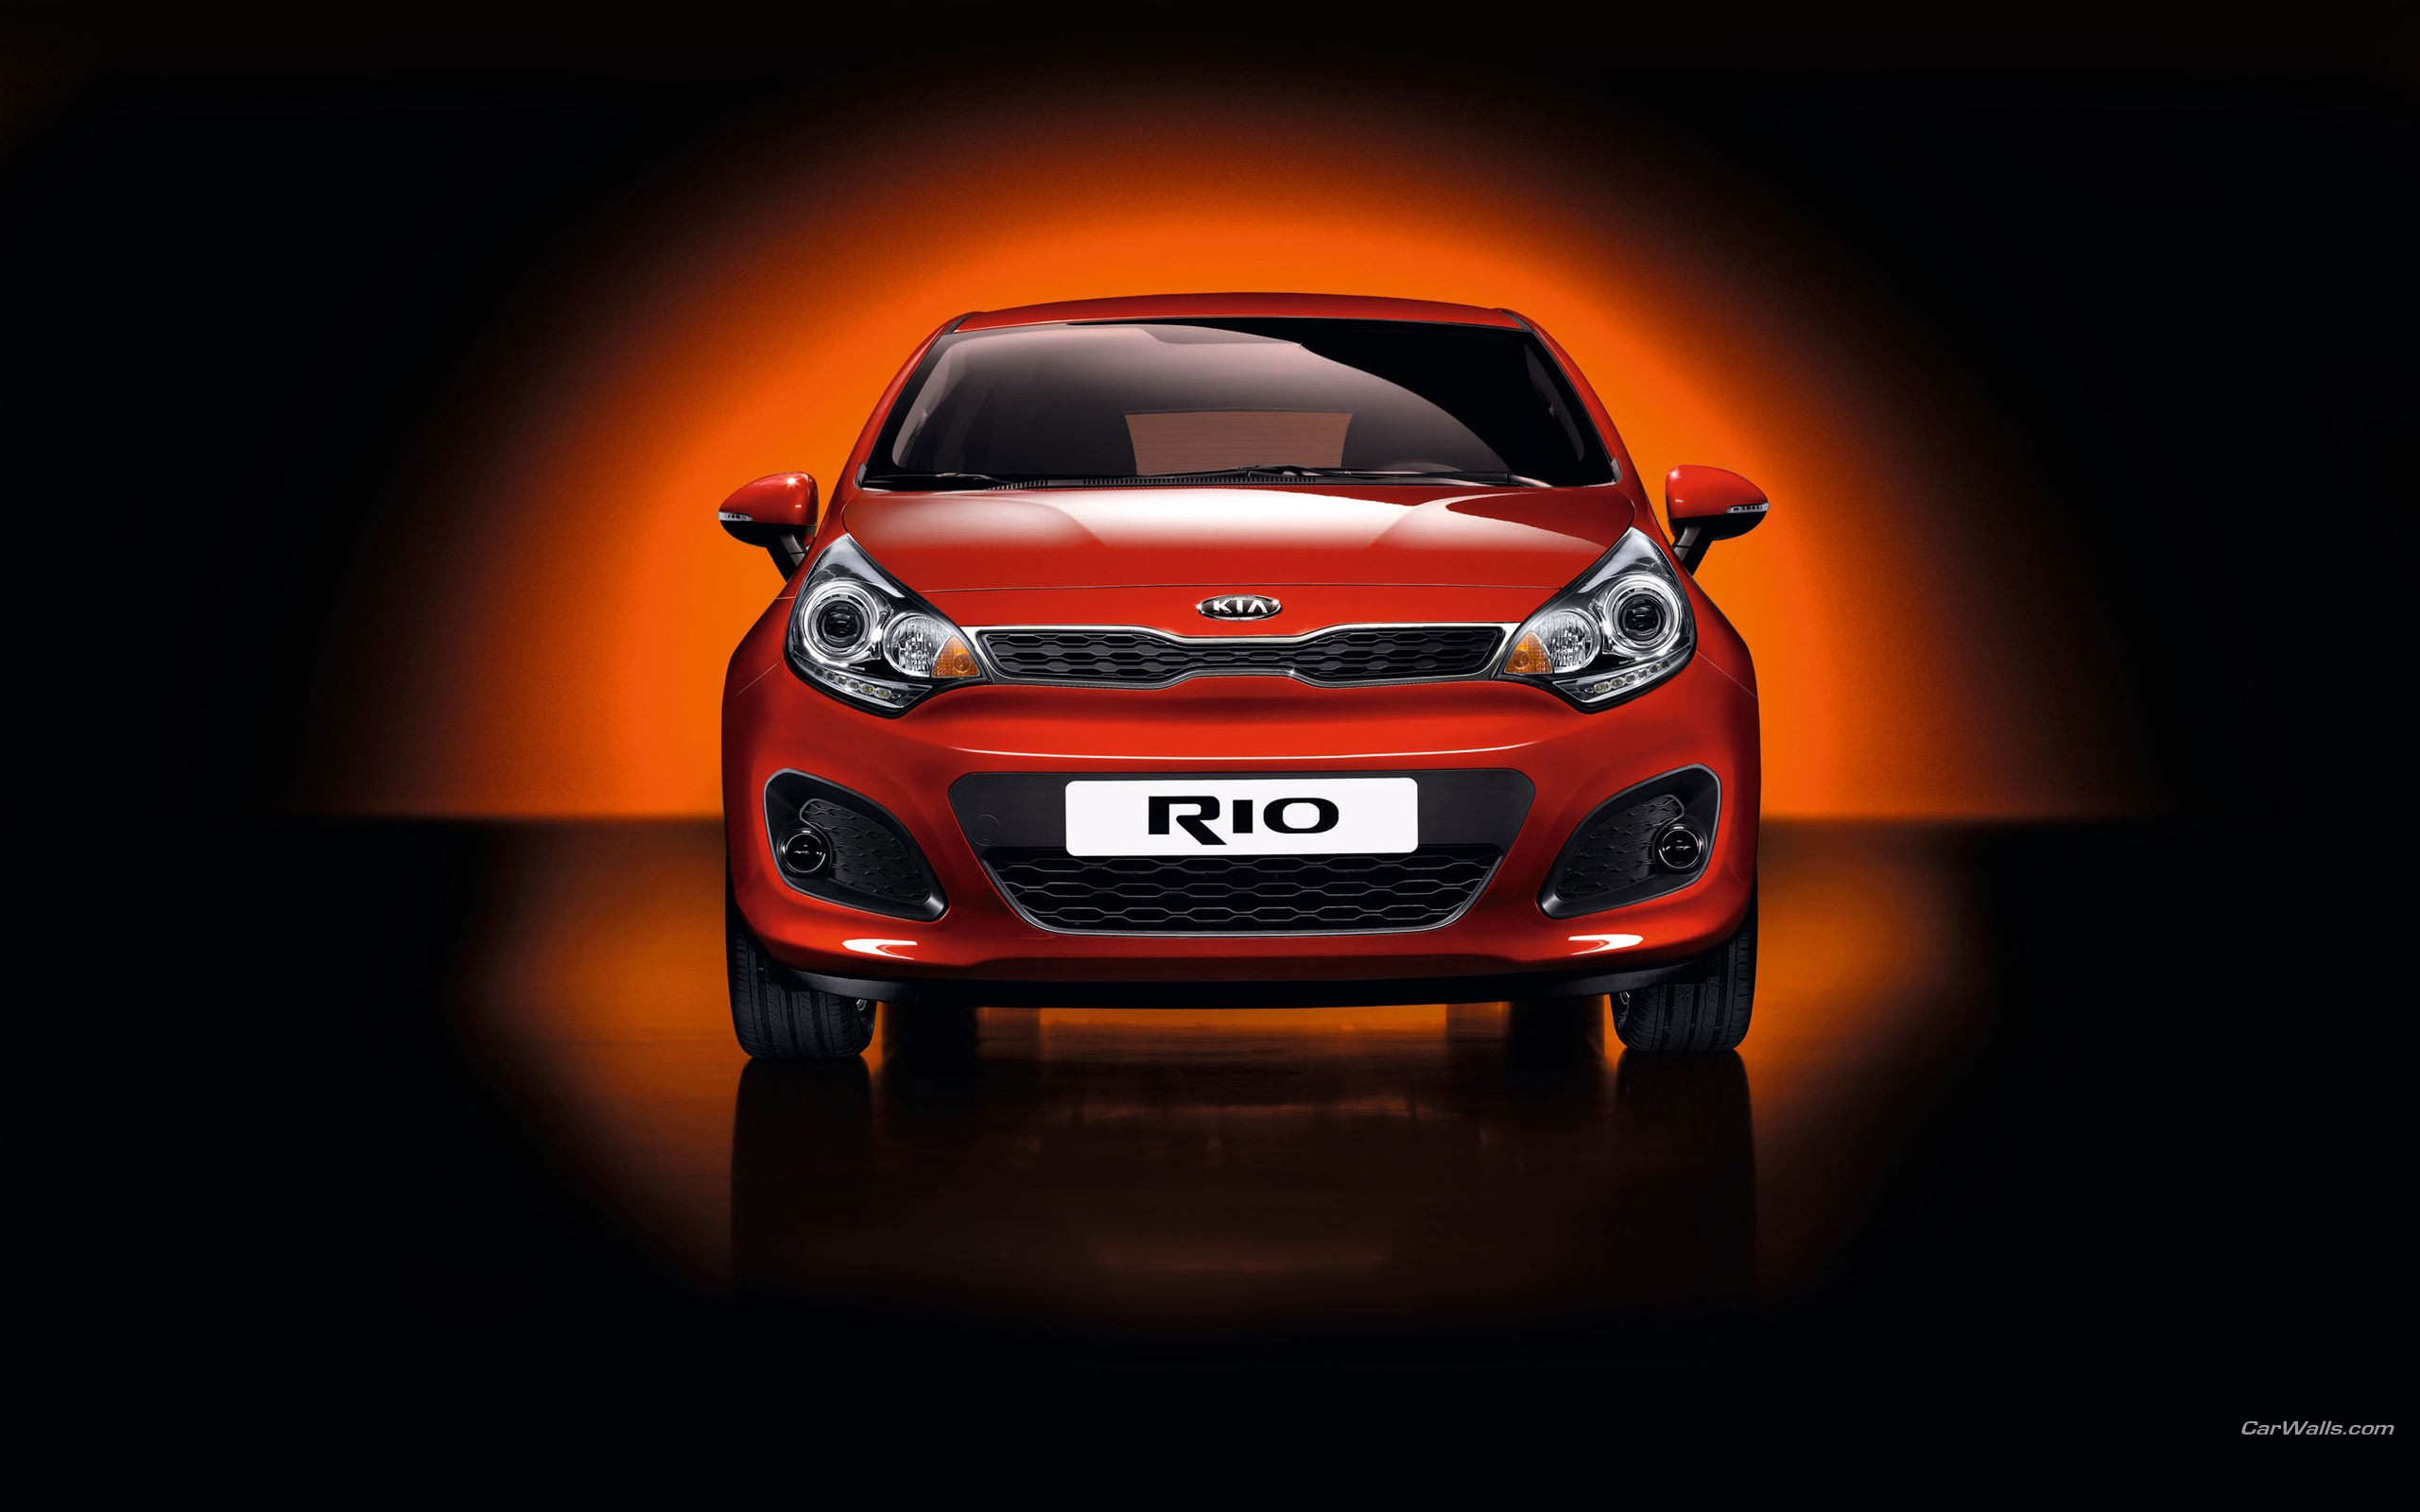 kia show today angeles concept los jaguar ecosport turbo s autos news soul h ford pace todays auto i car